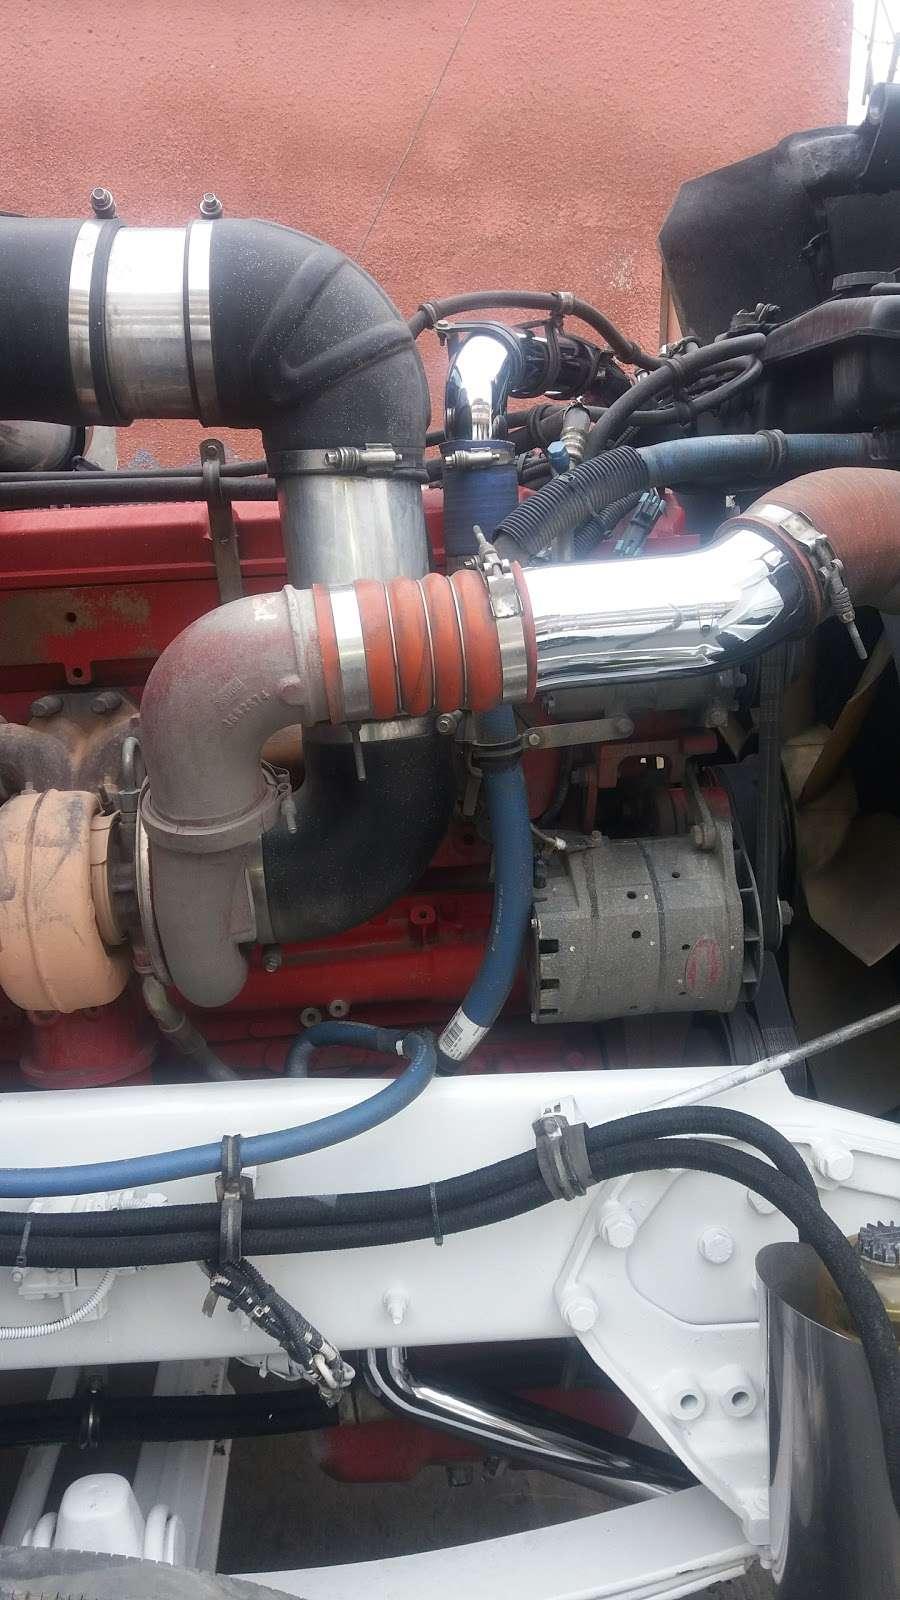 Cummins Sales and Service - car repair  | Photo 7 of 10 | Address: 3700 Jeff Adams Dr, Charlotte, NC 28206, USA | Phone: (704) 596-7690